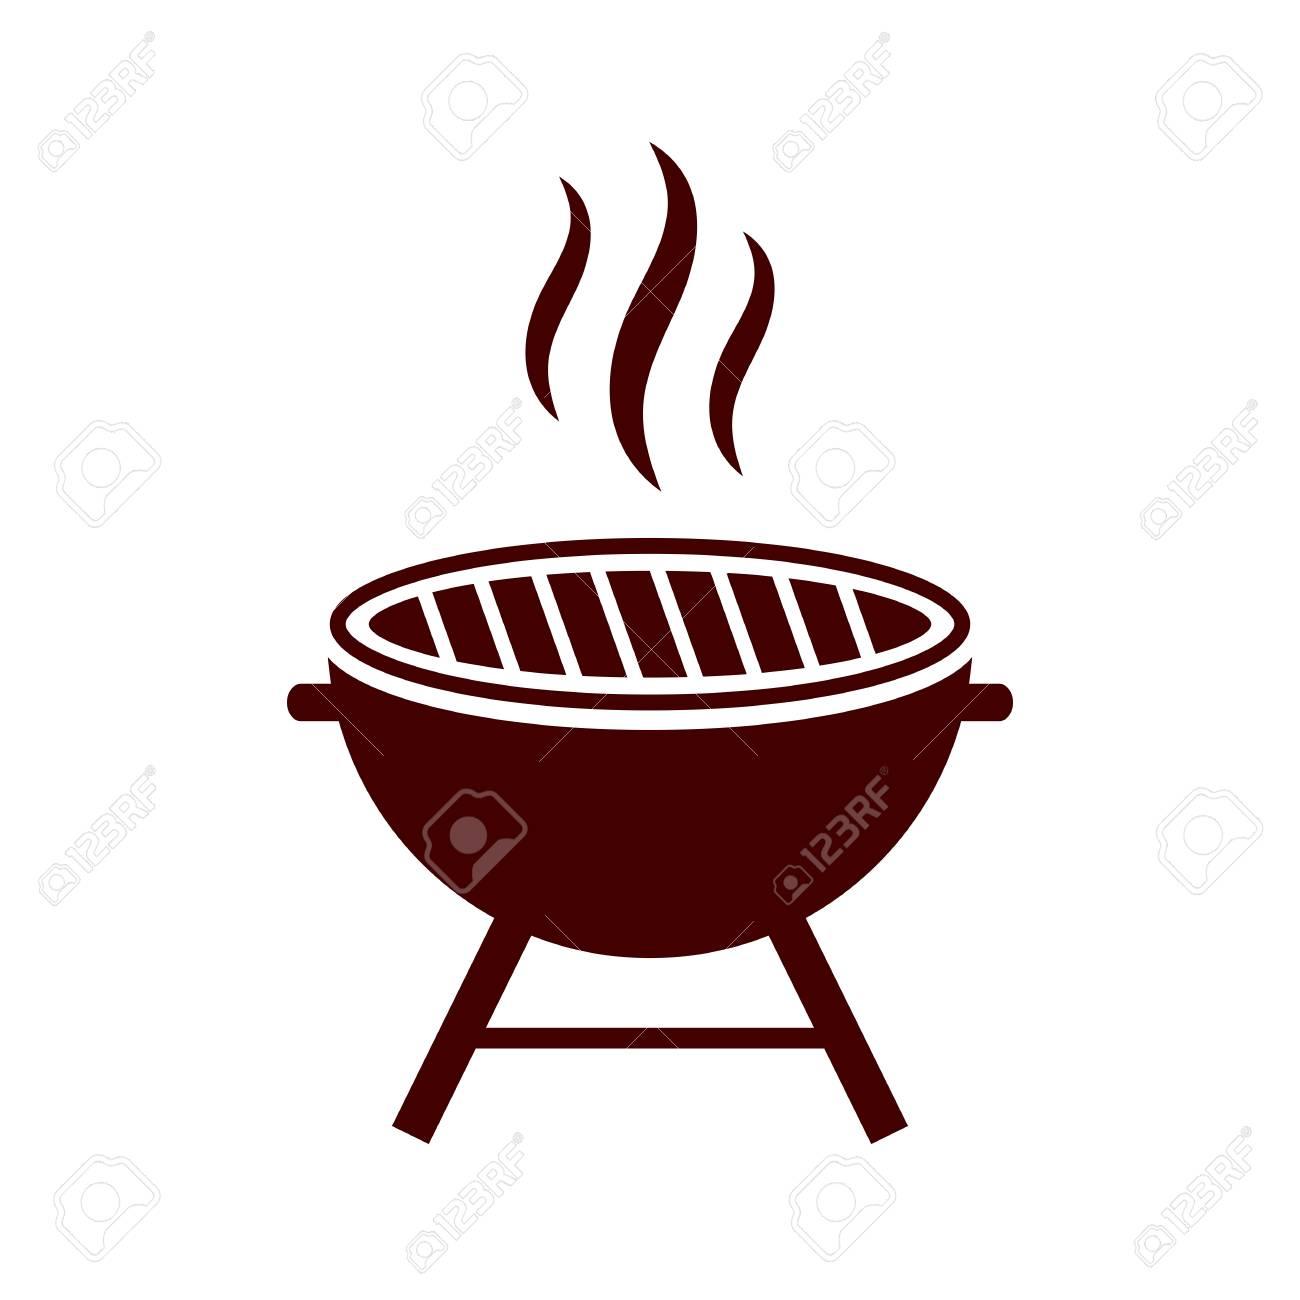 Barbecue Grill Vector